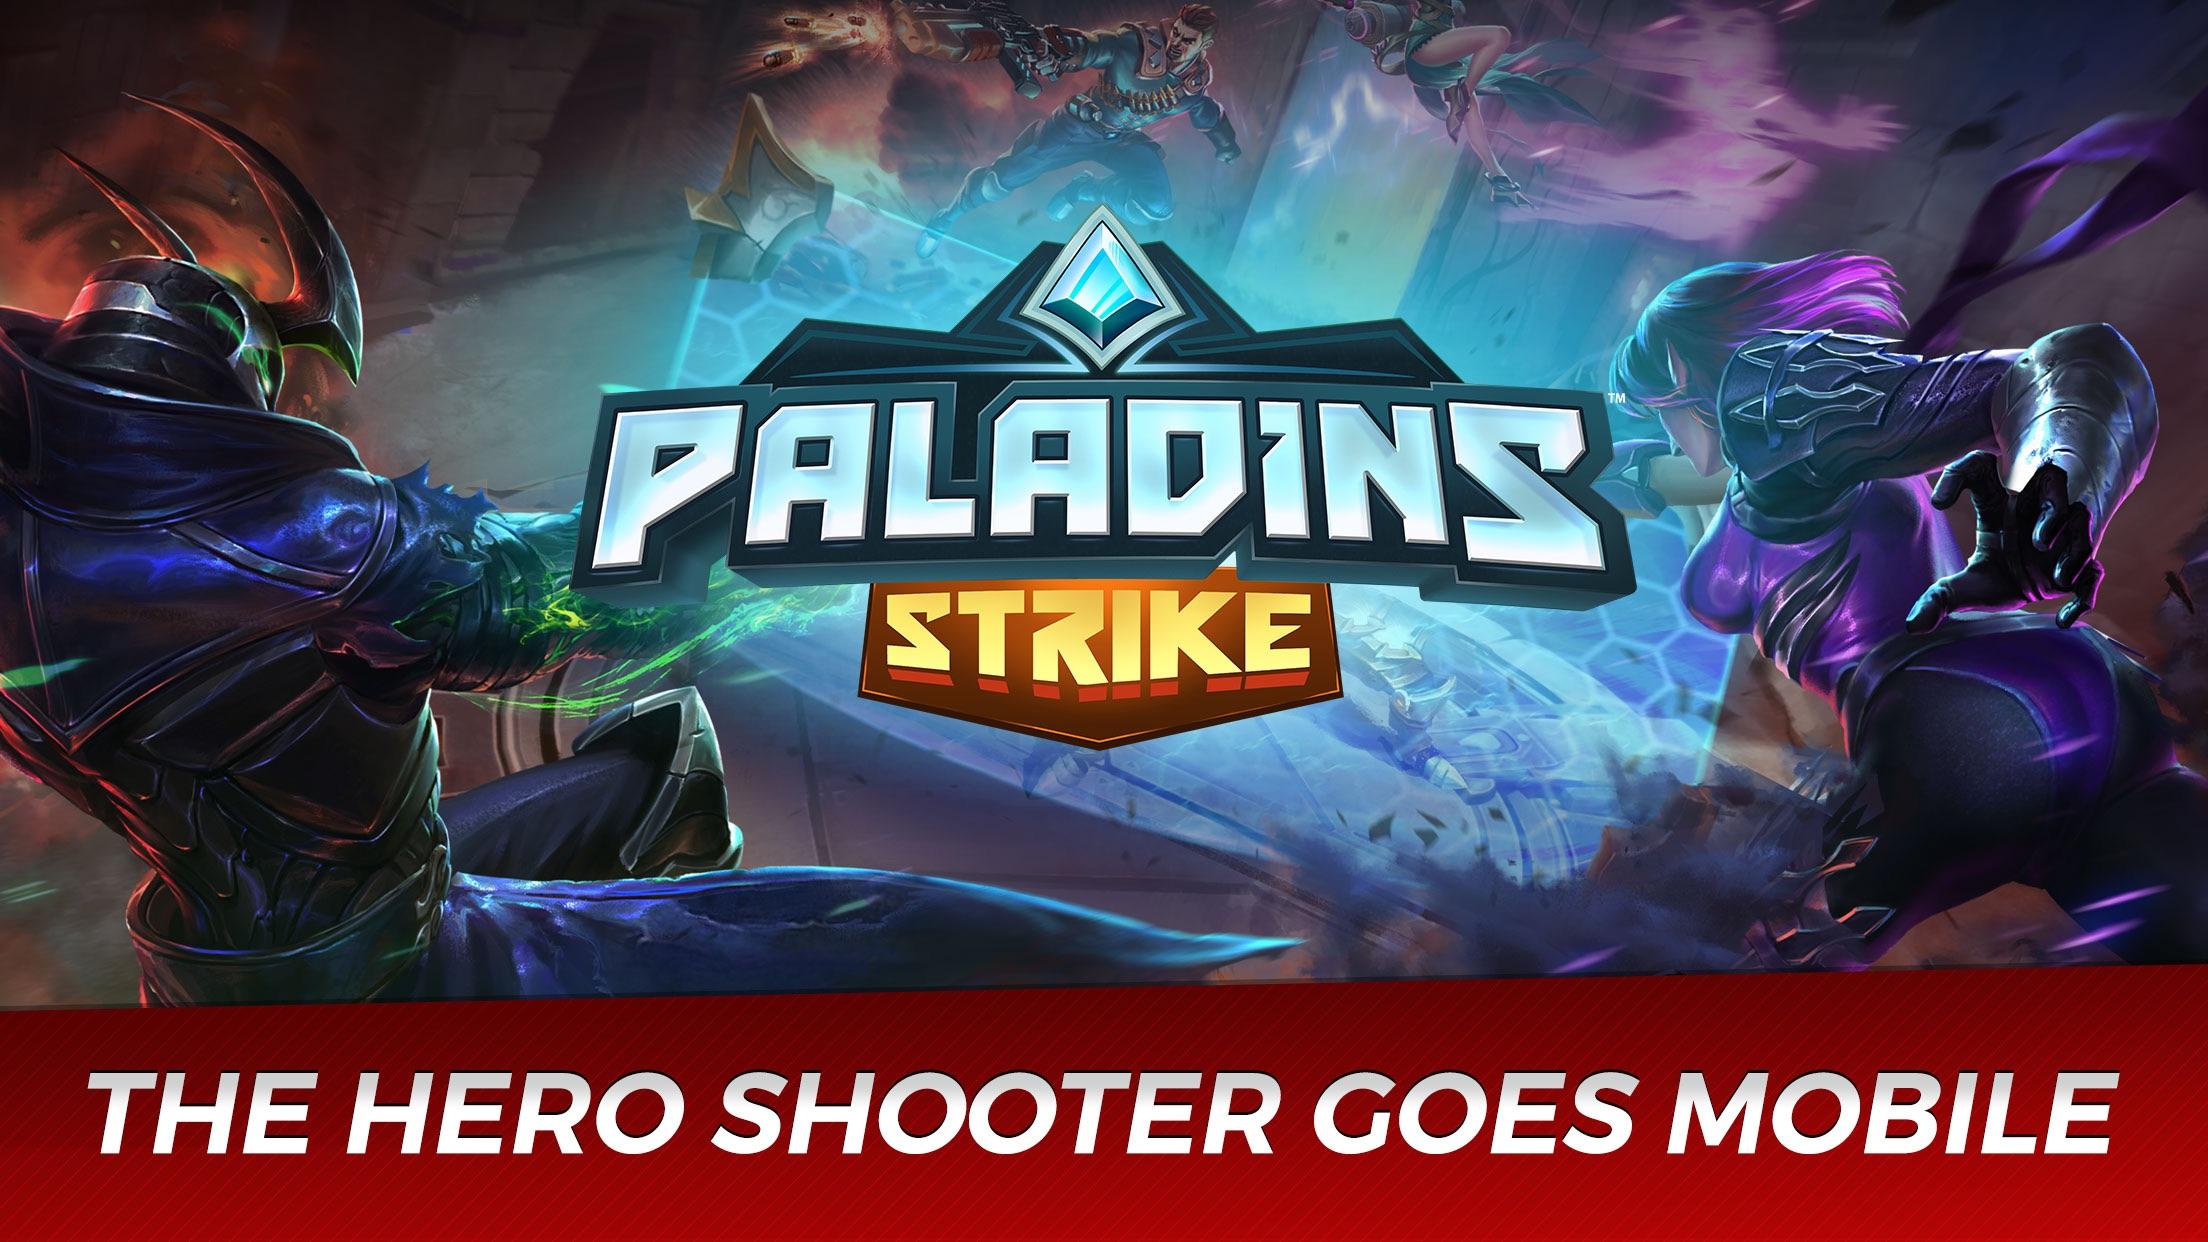 Paladins Strike Screenshot